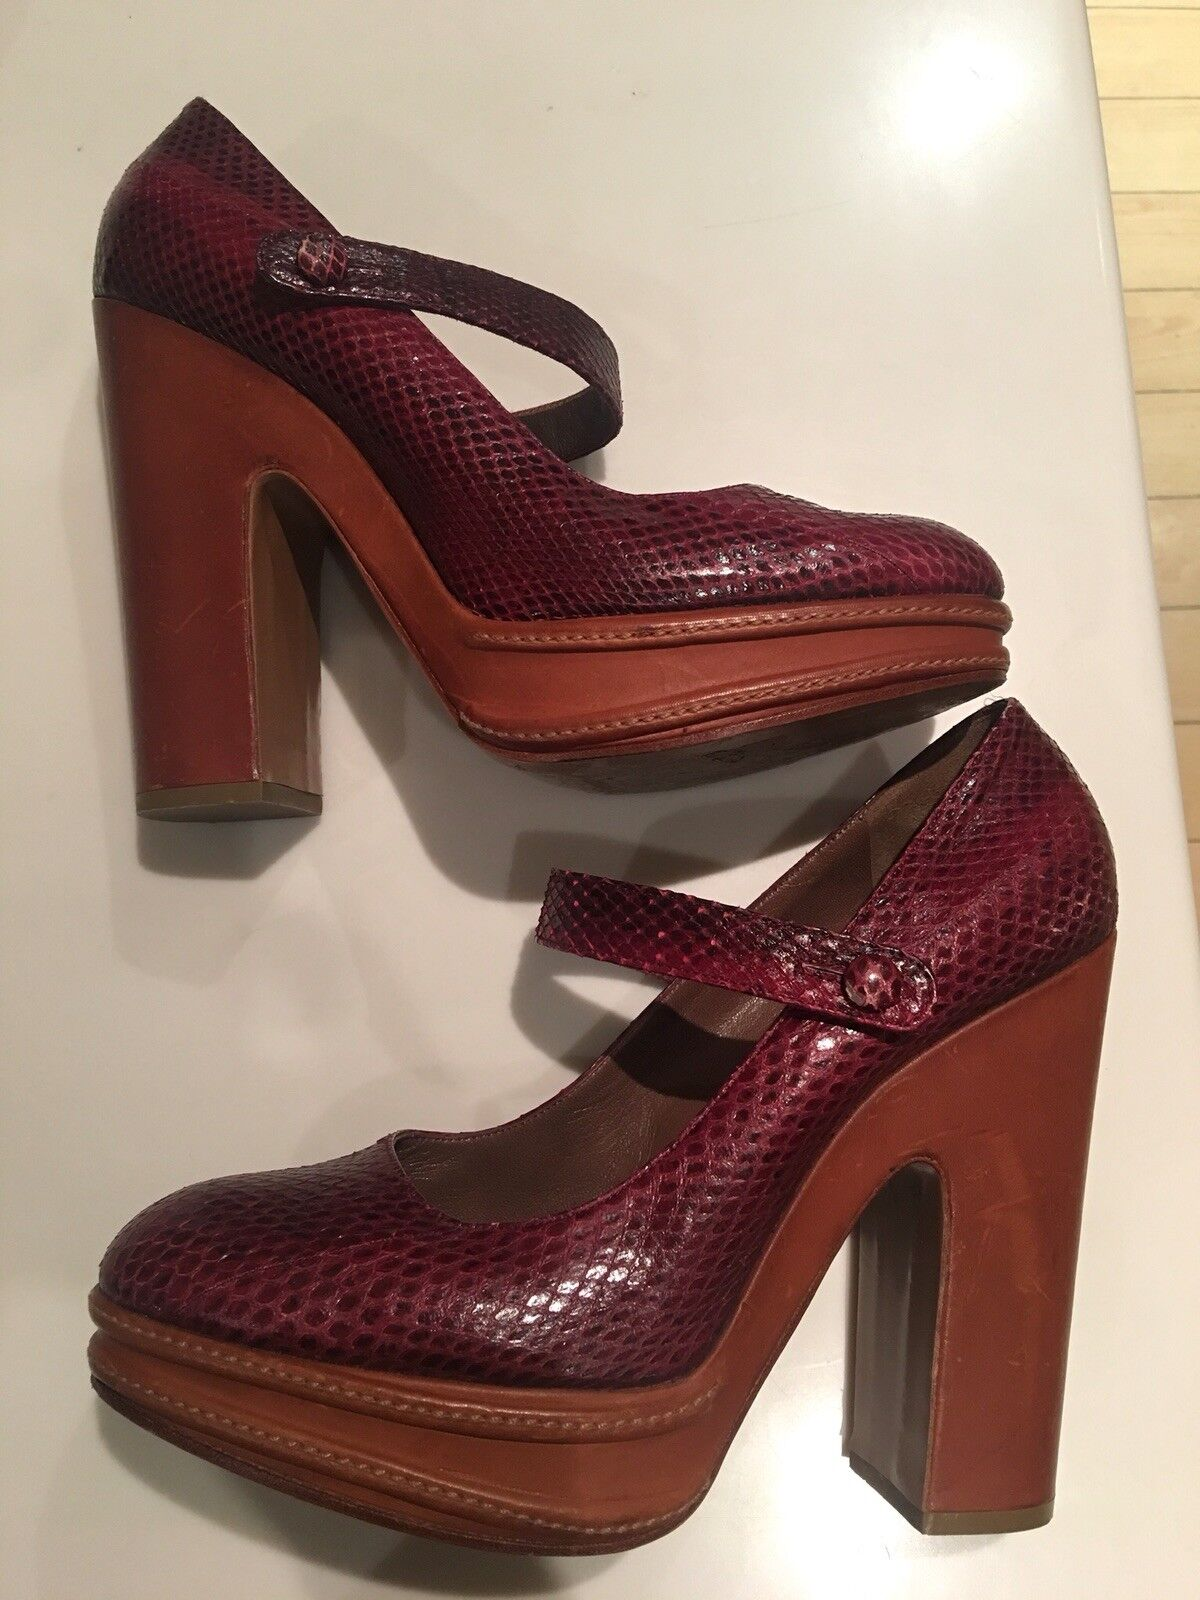 Marni High Heels Platform Python Skin Burgundy shoes Mary Janes Sz 41 Eu 7 Uk